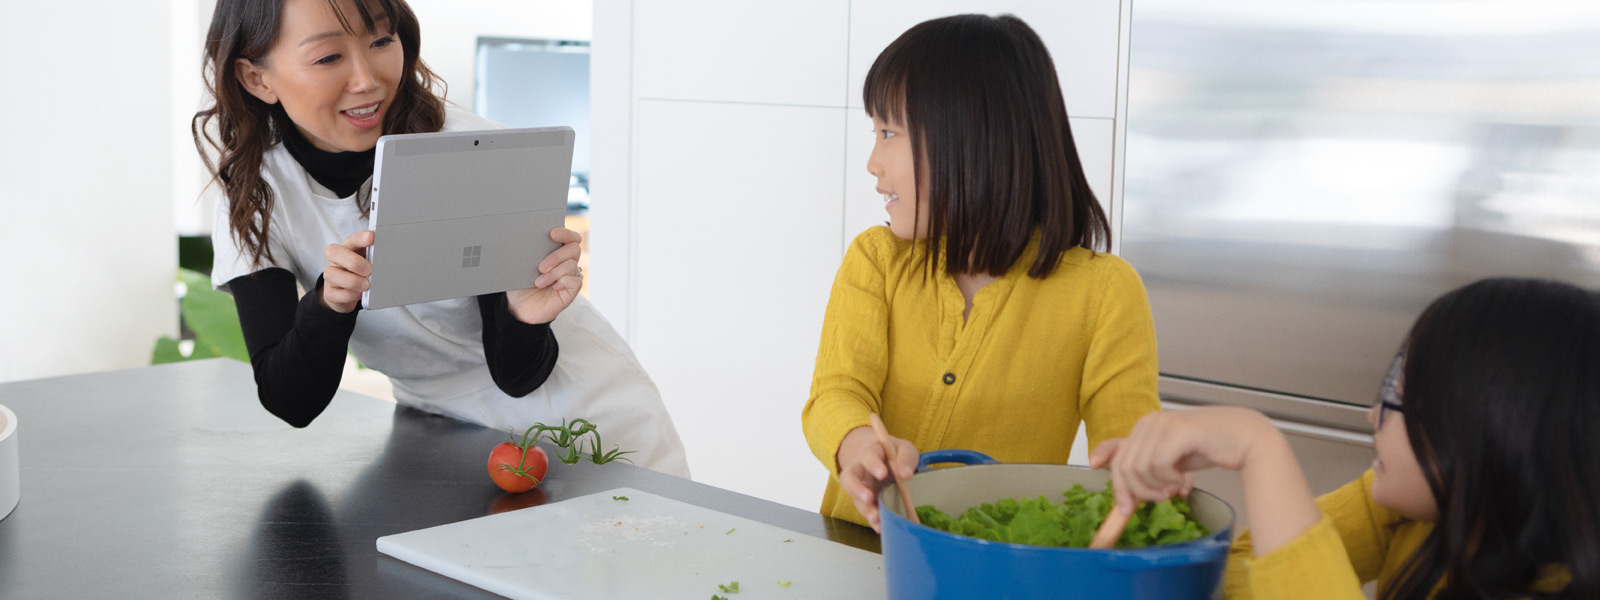 女人使用 Surface Go 幫她的小孩拍照